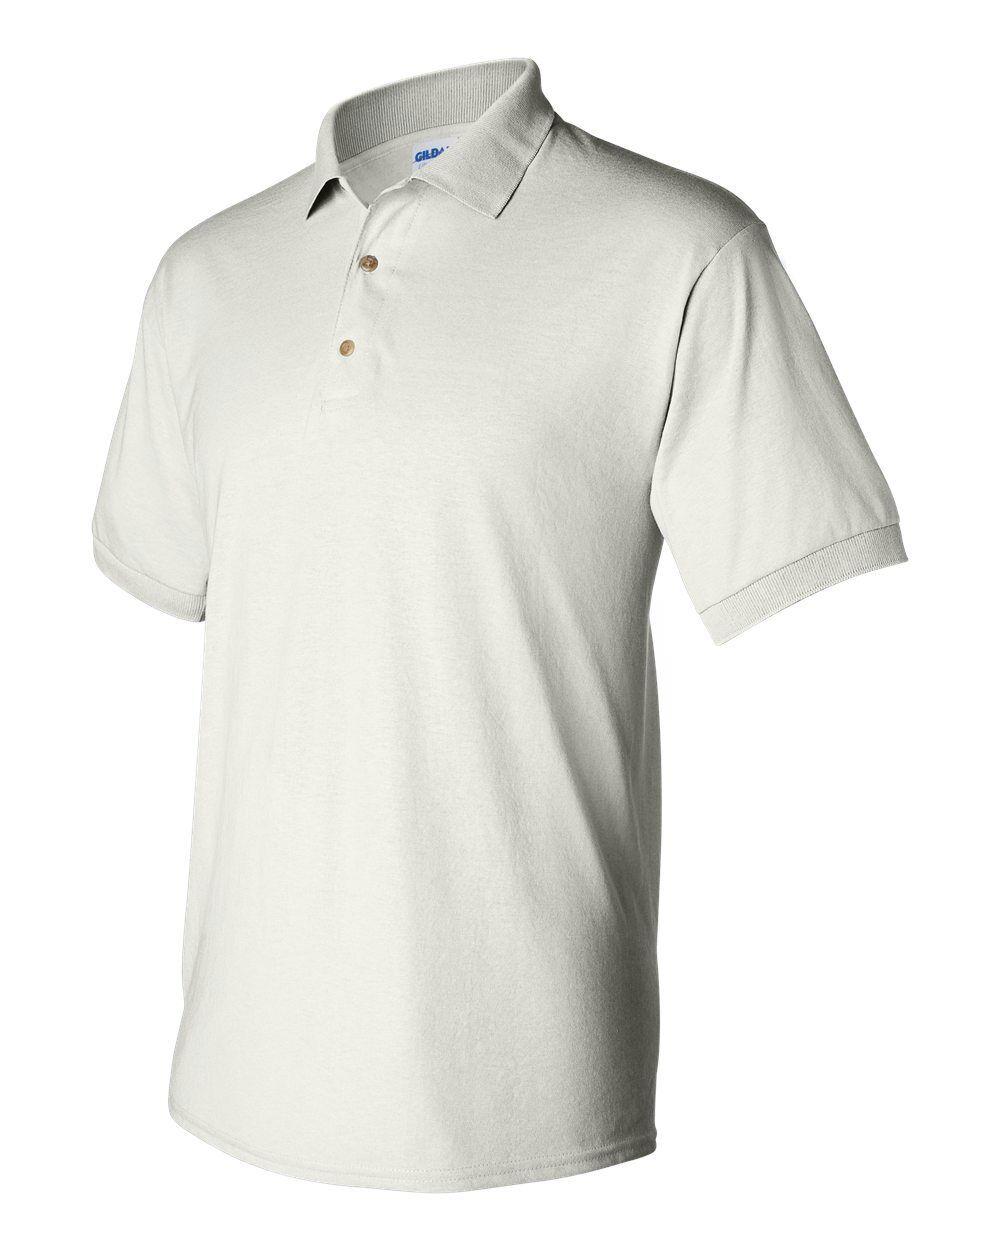 25 Blank Gildan DryBlend Weiß Jersey Polo 8800 Bulk Lot Wholesale S-XL G880